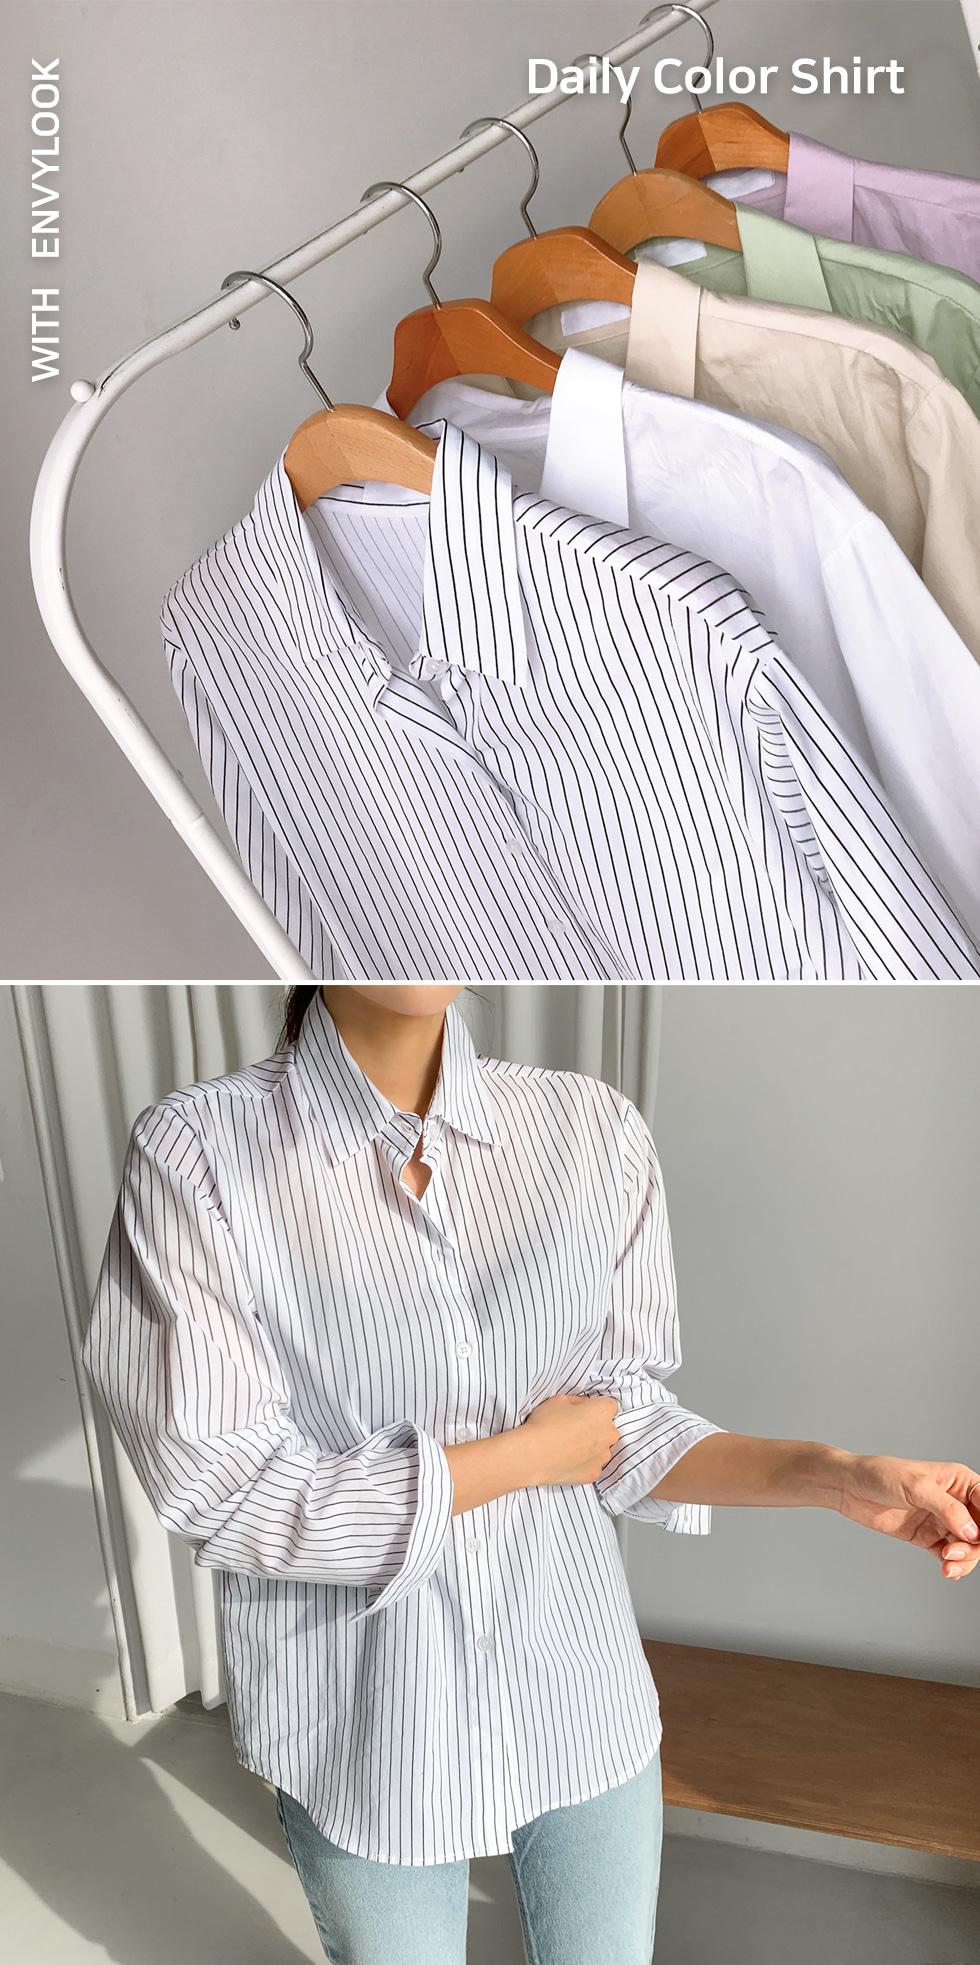 Two type shirt